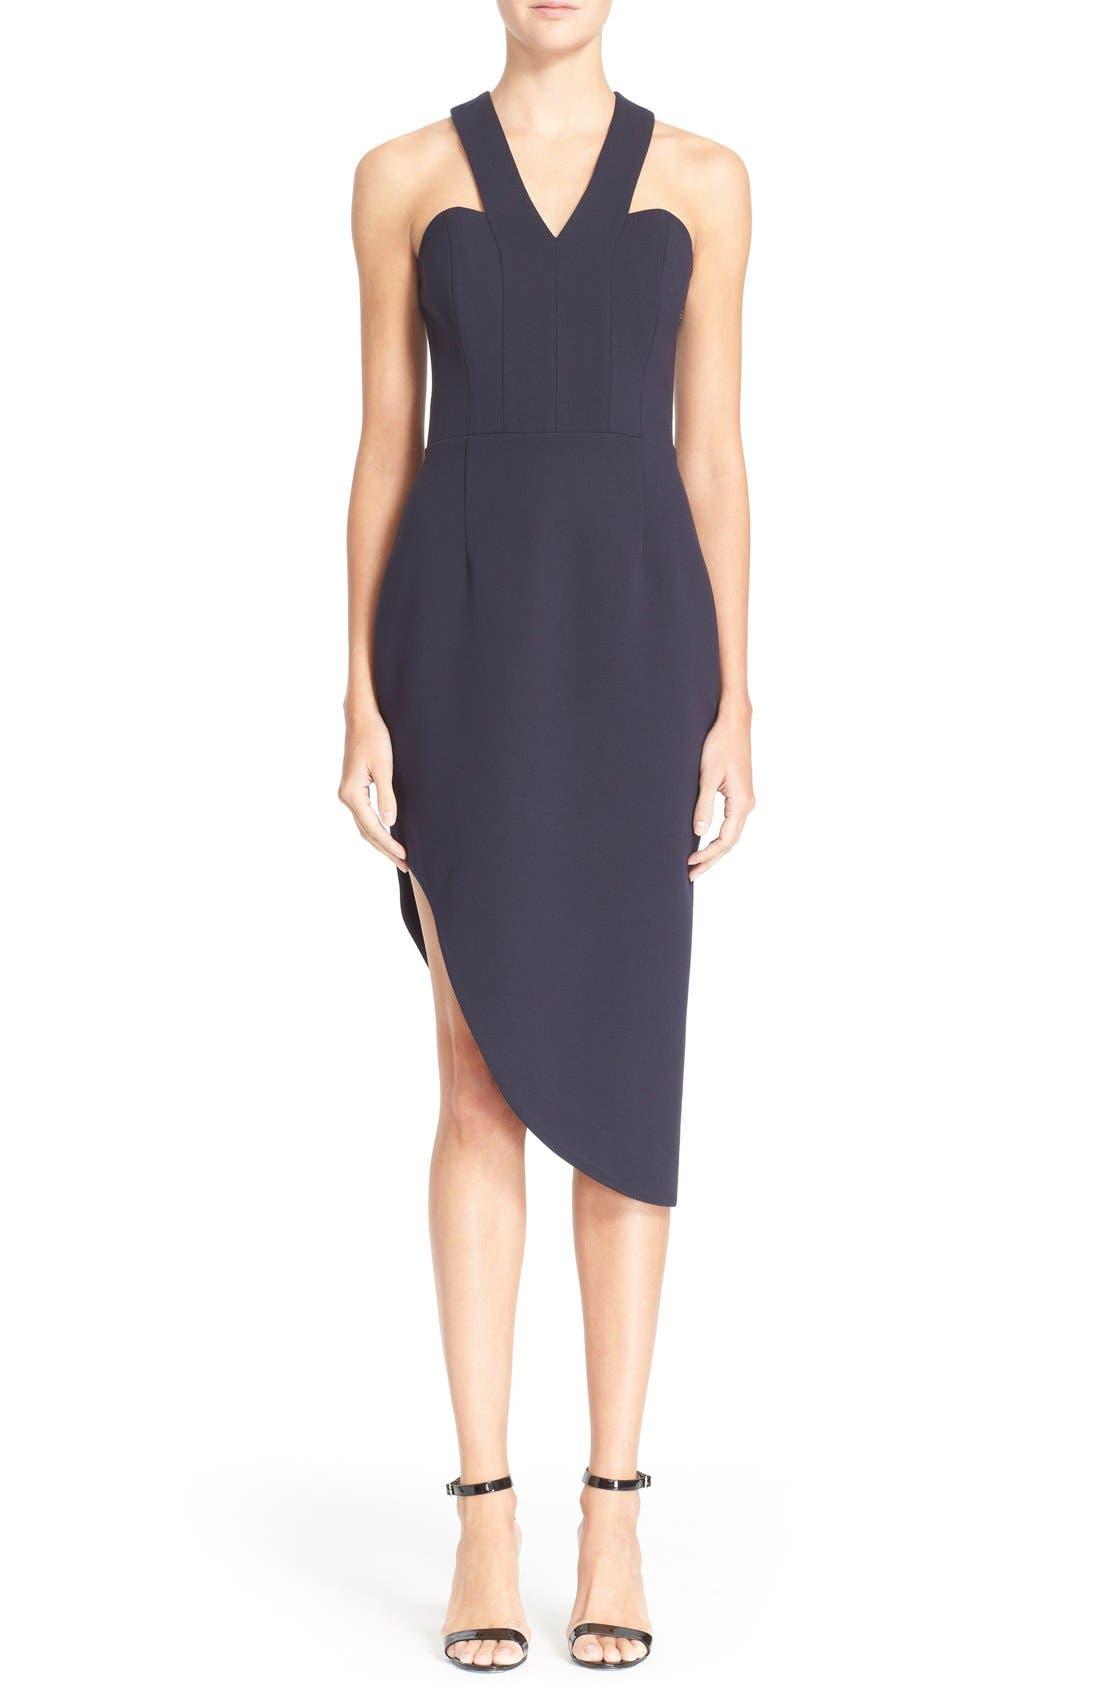 Alternate Image 1 Selected - N Nicholas 'Ponti Curve' Halter Dress with Asymmetrical Hem